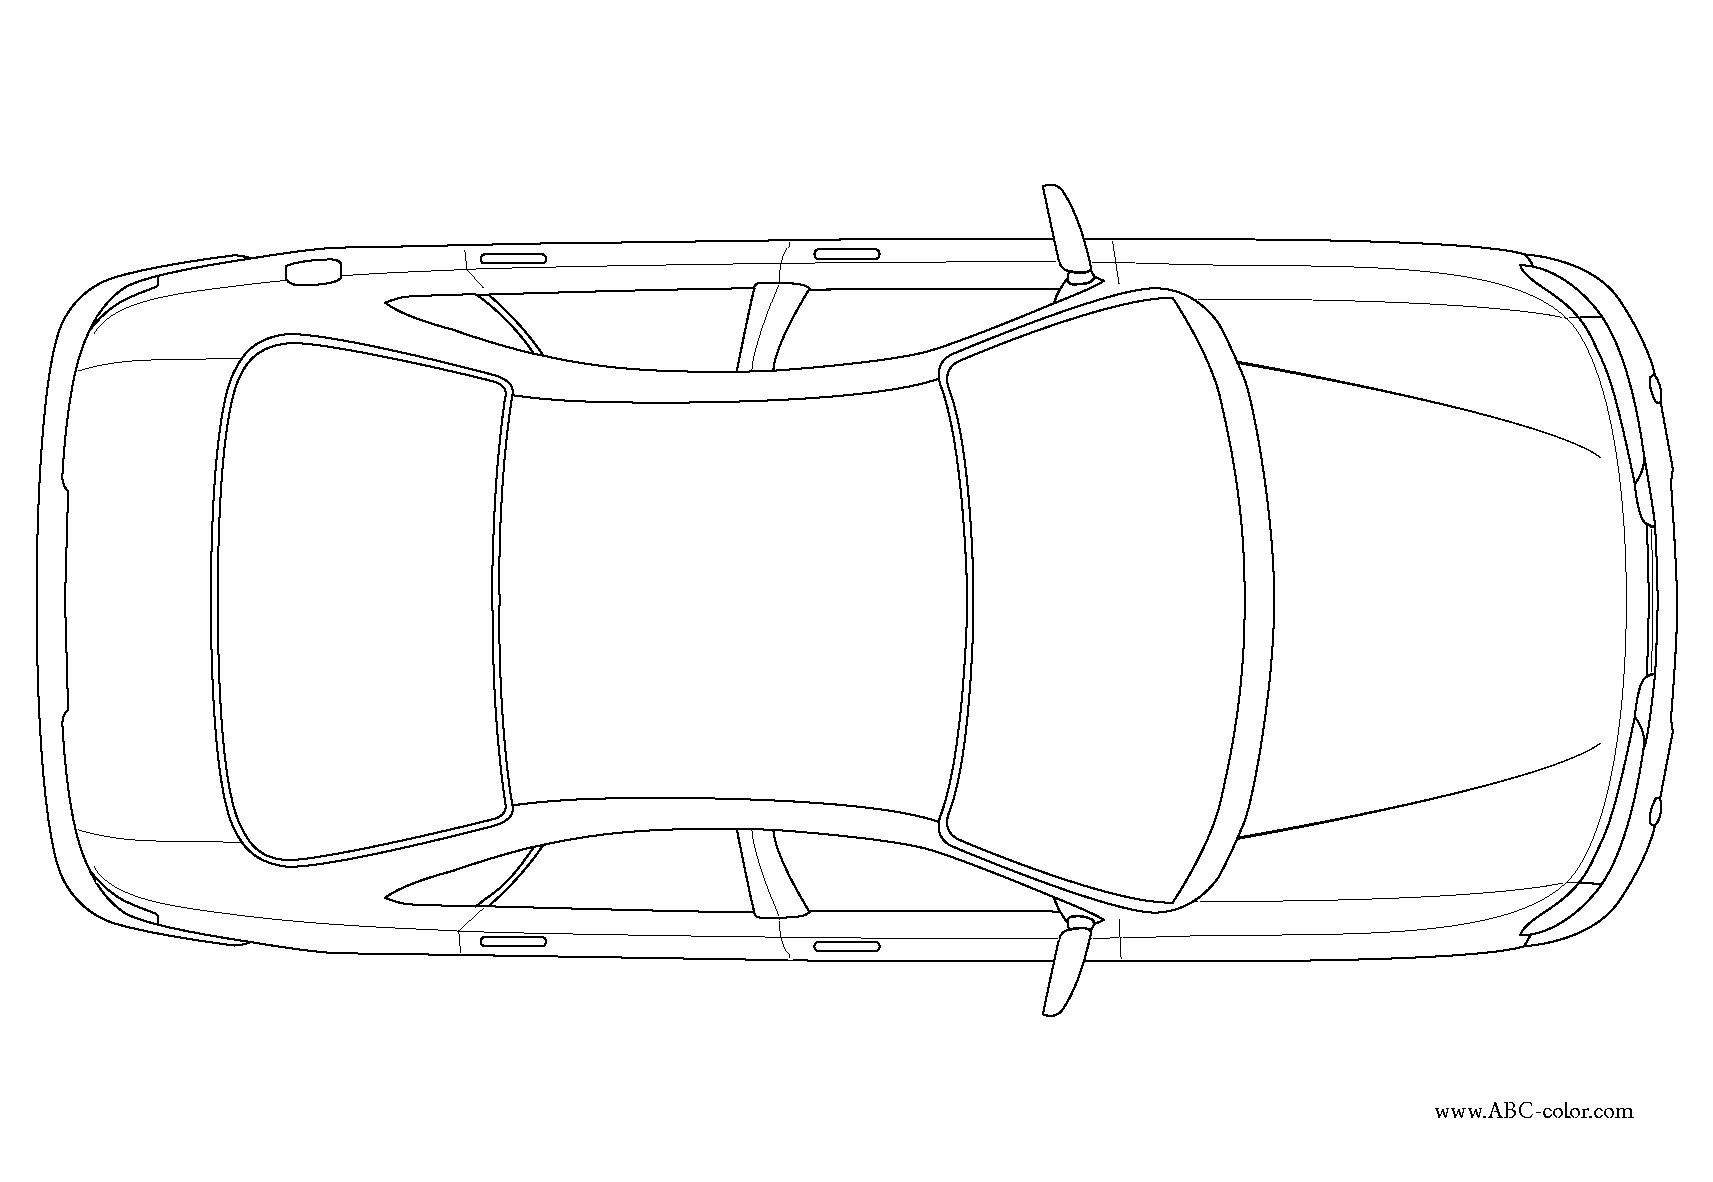 Car Top View Sketch At Paintingvalley